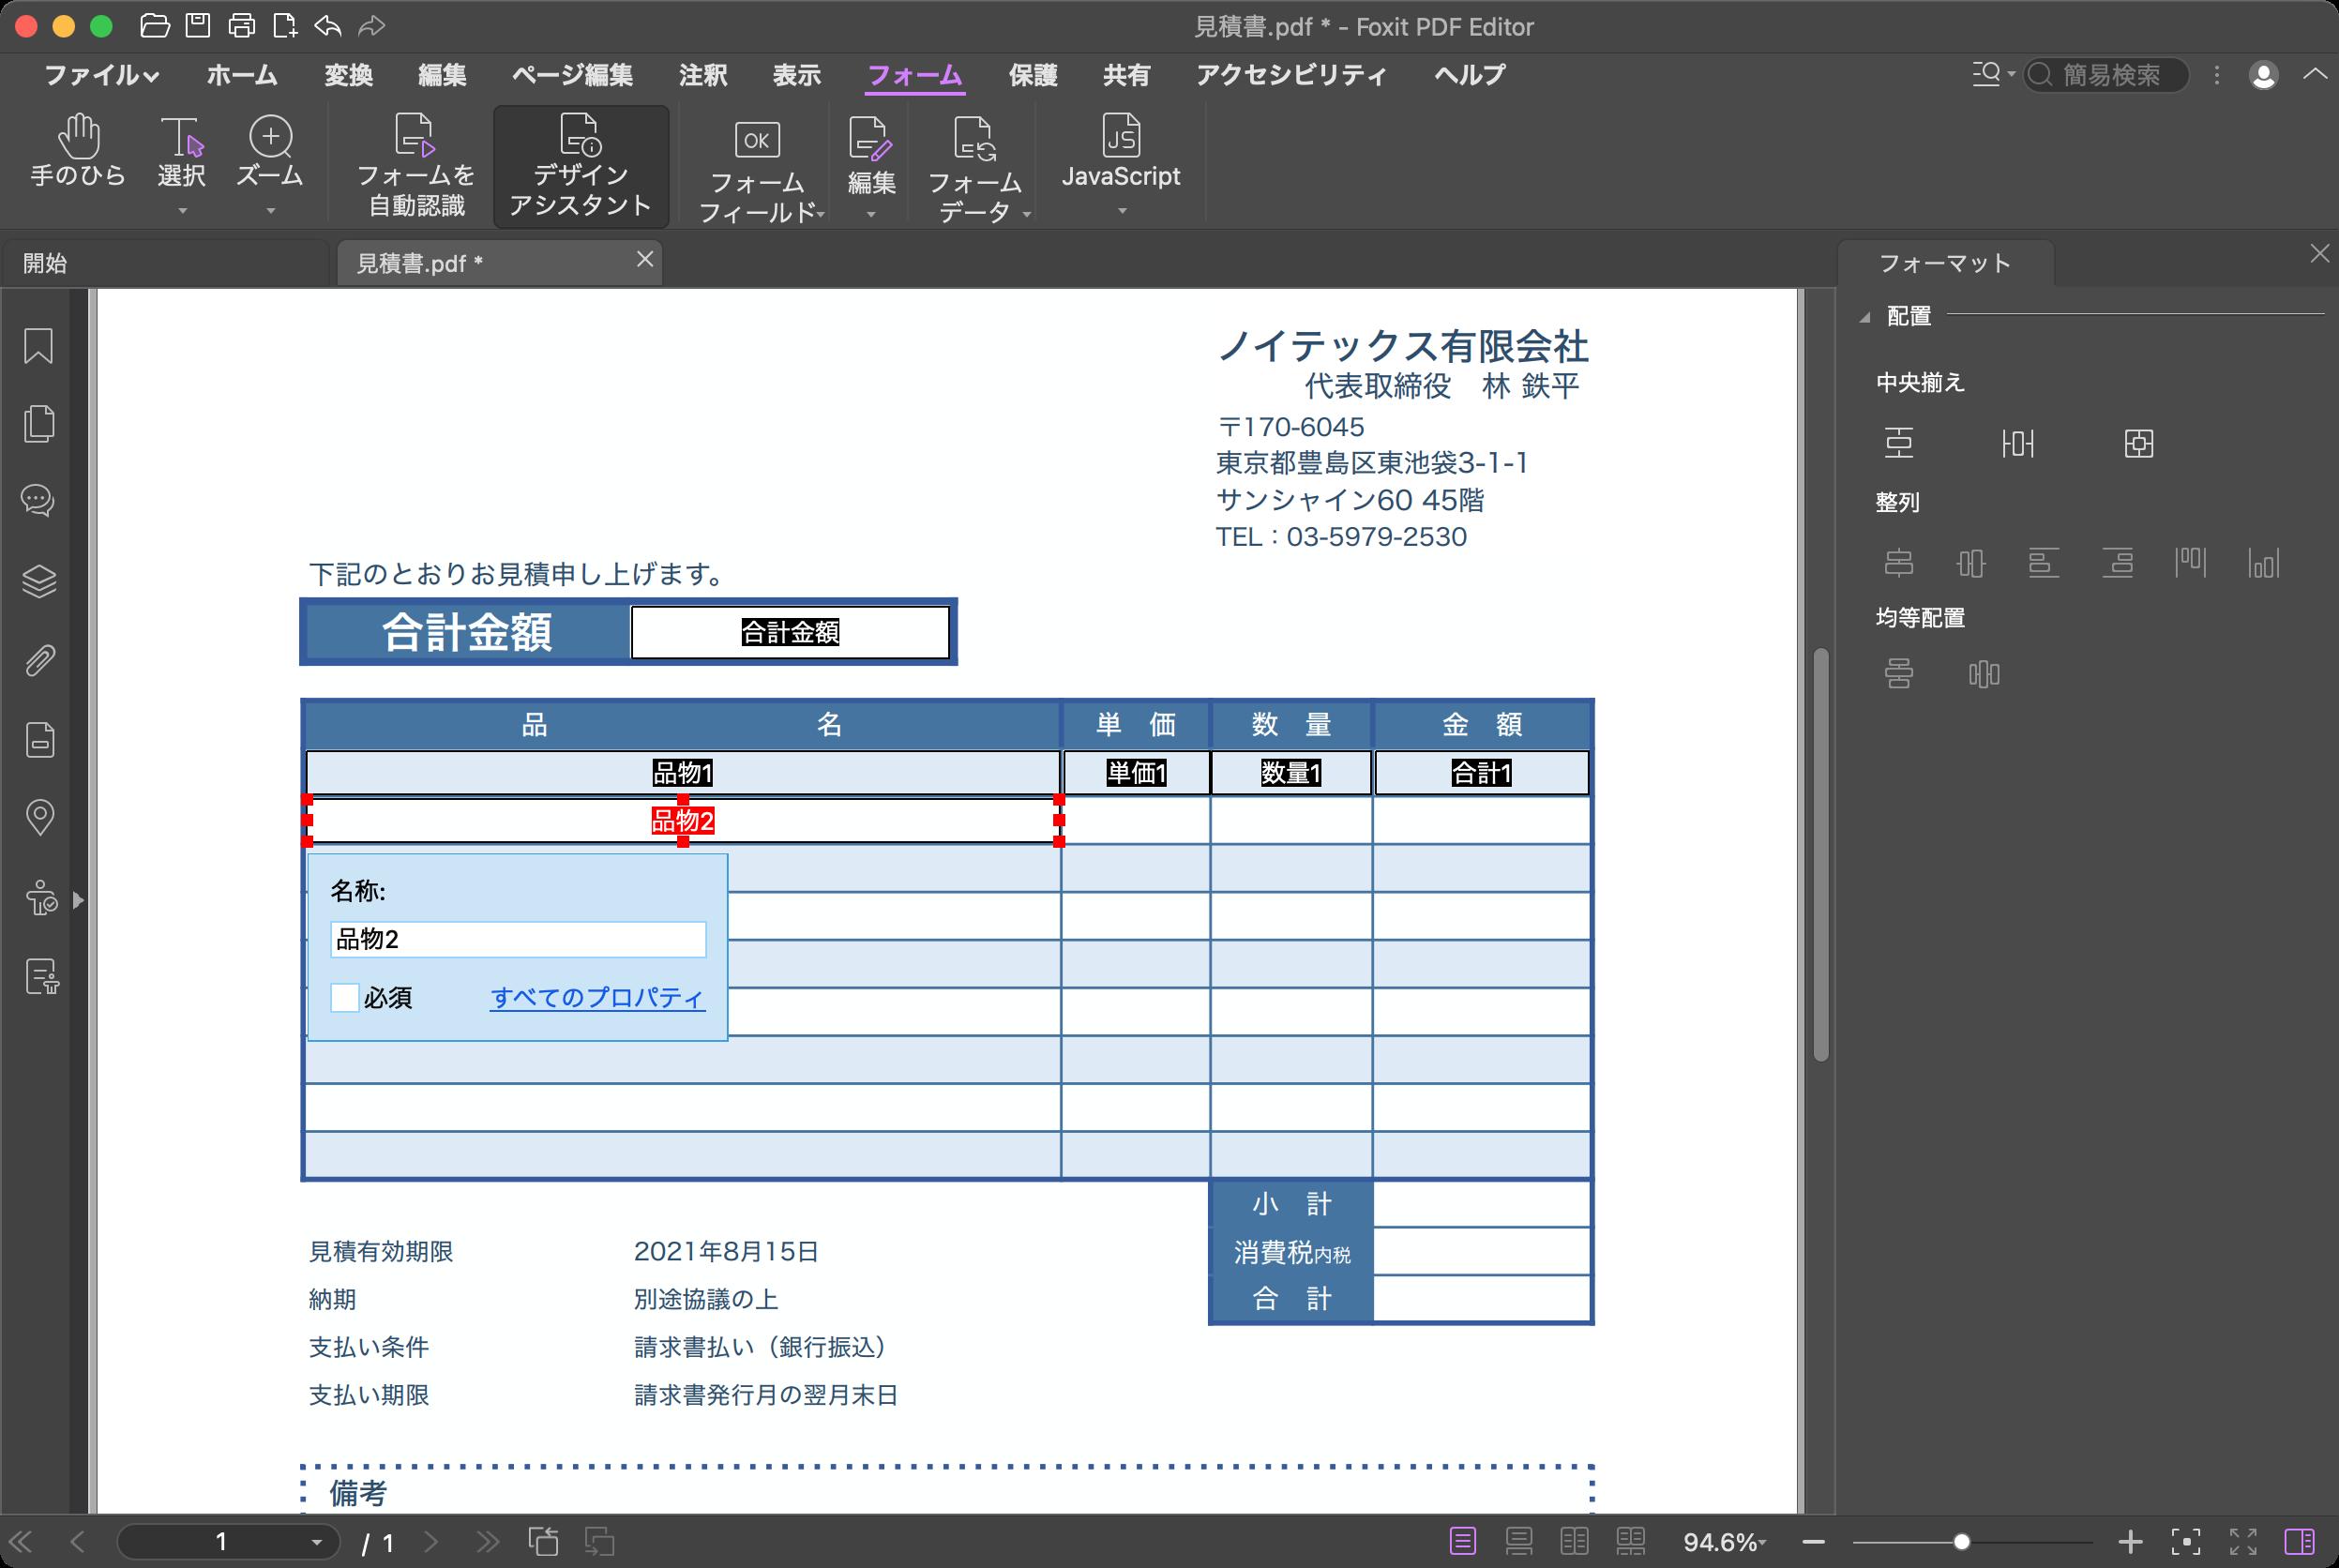 Foxit PDF Editor フォーム入力